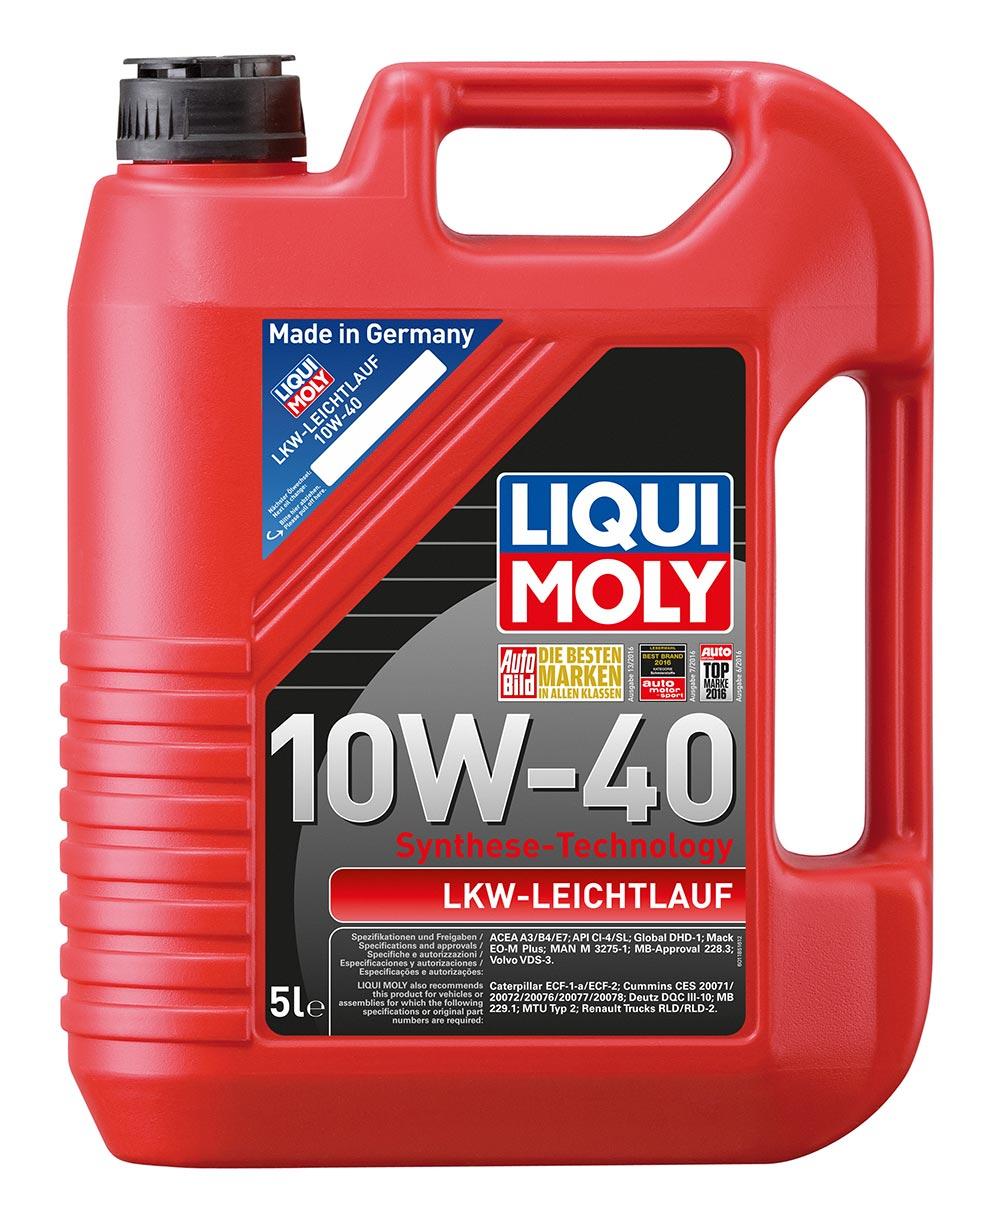 Масло моторное полусинт. LKW-Leichtlauf-Motoroil Basic 10W-40 (5л) пластик